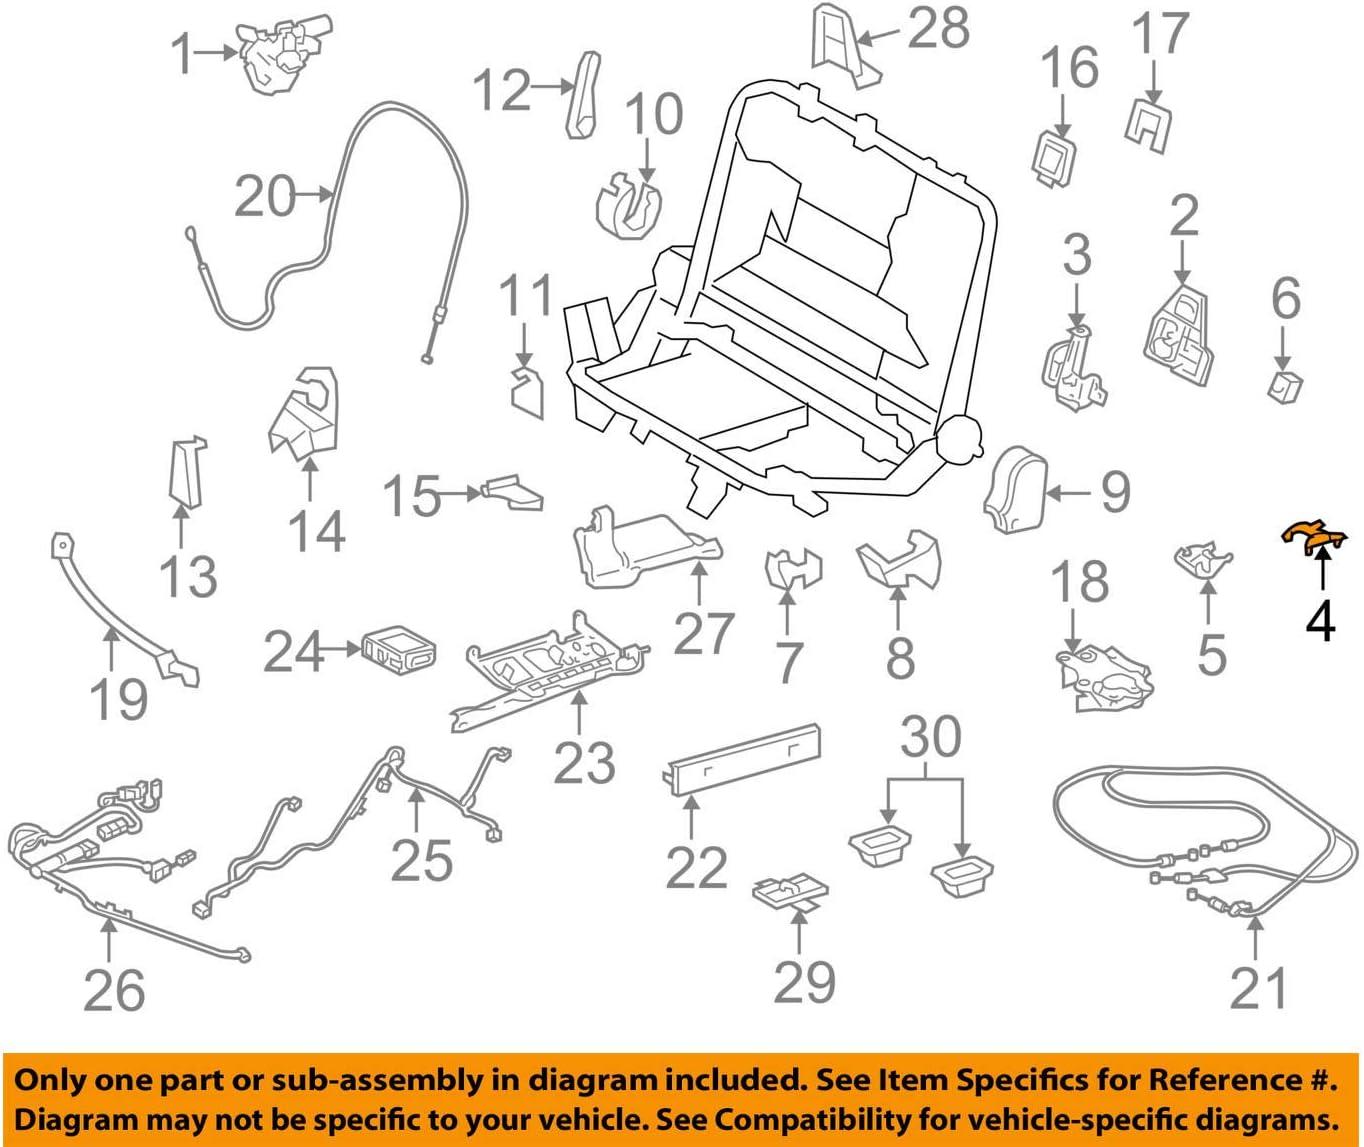 TOYOTA Genuine 72615-60010-C0 Seat Back Lock Striker Cover